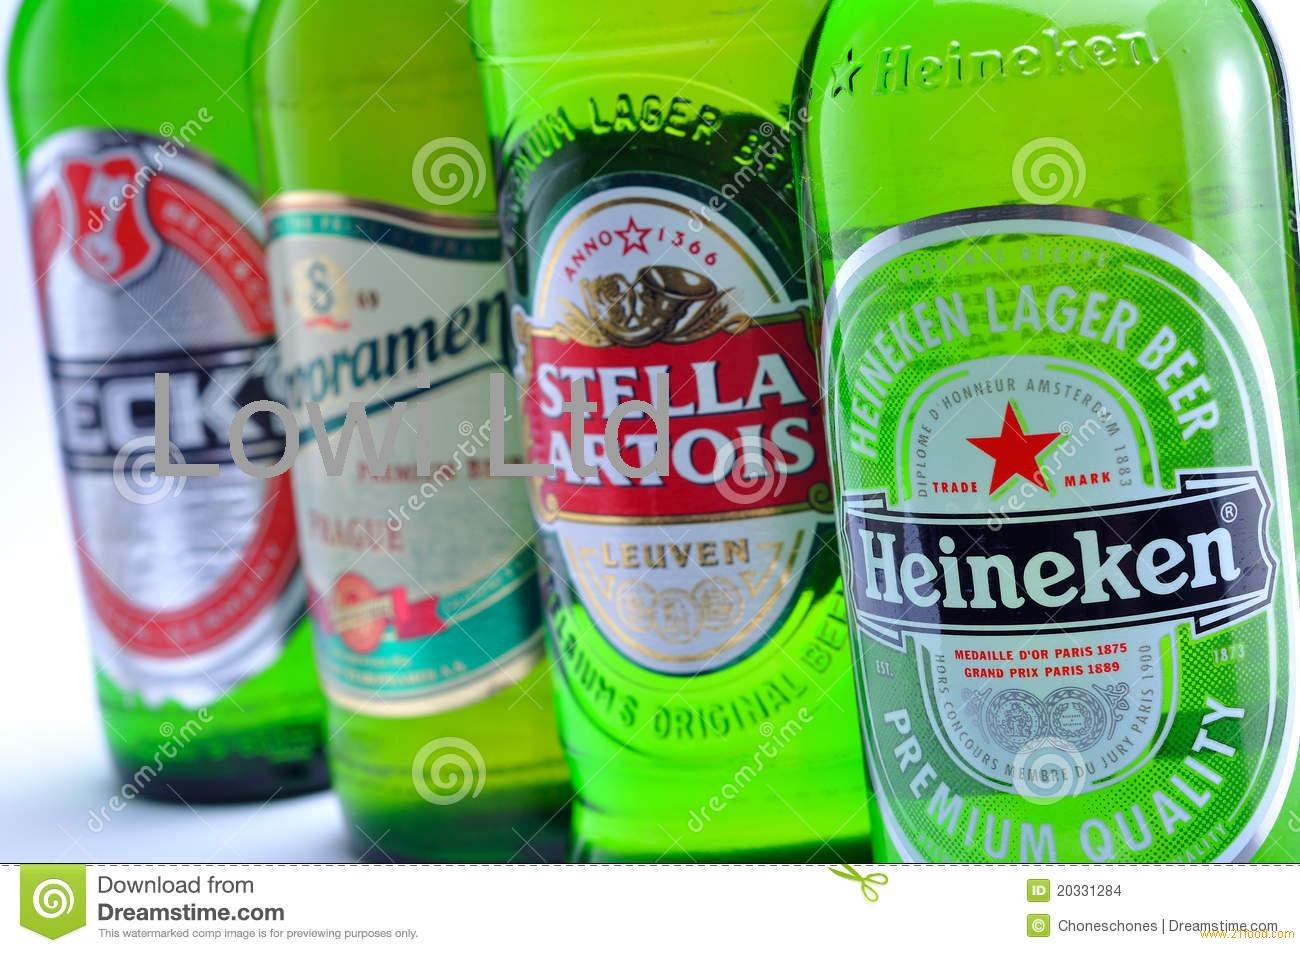 Heineken Lager Pics, Food Collection